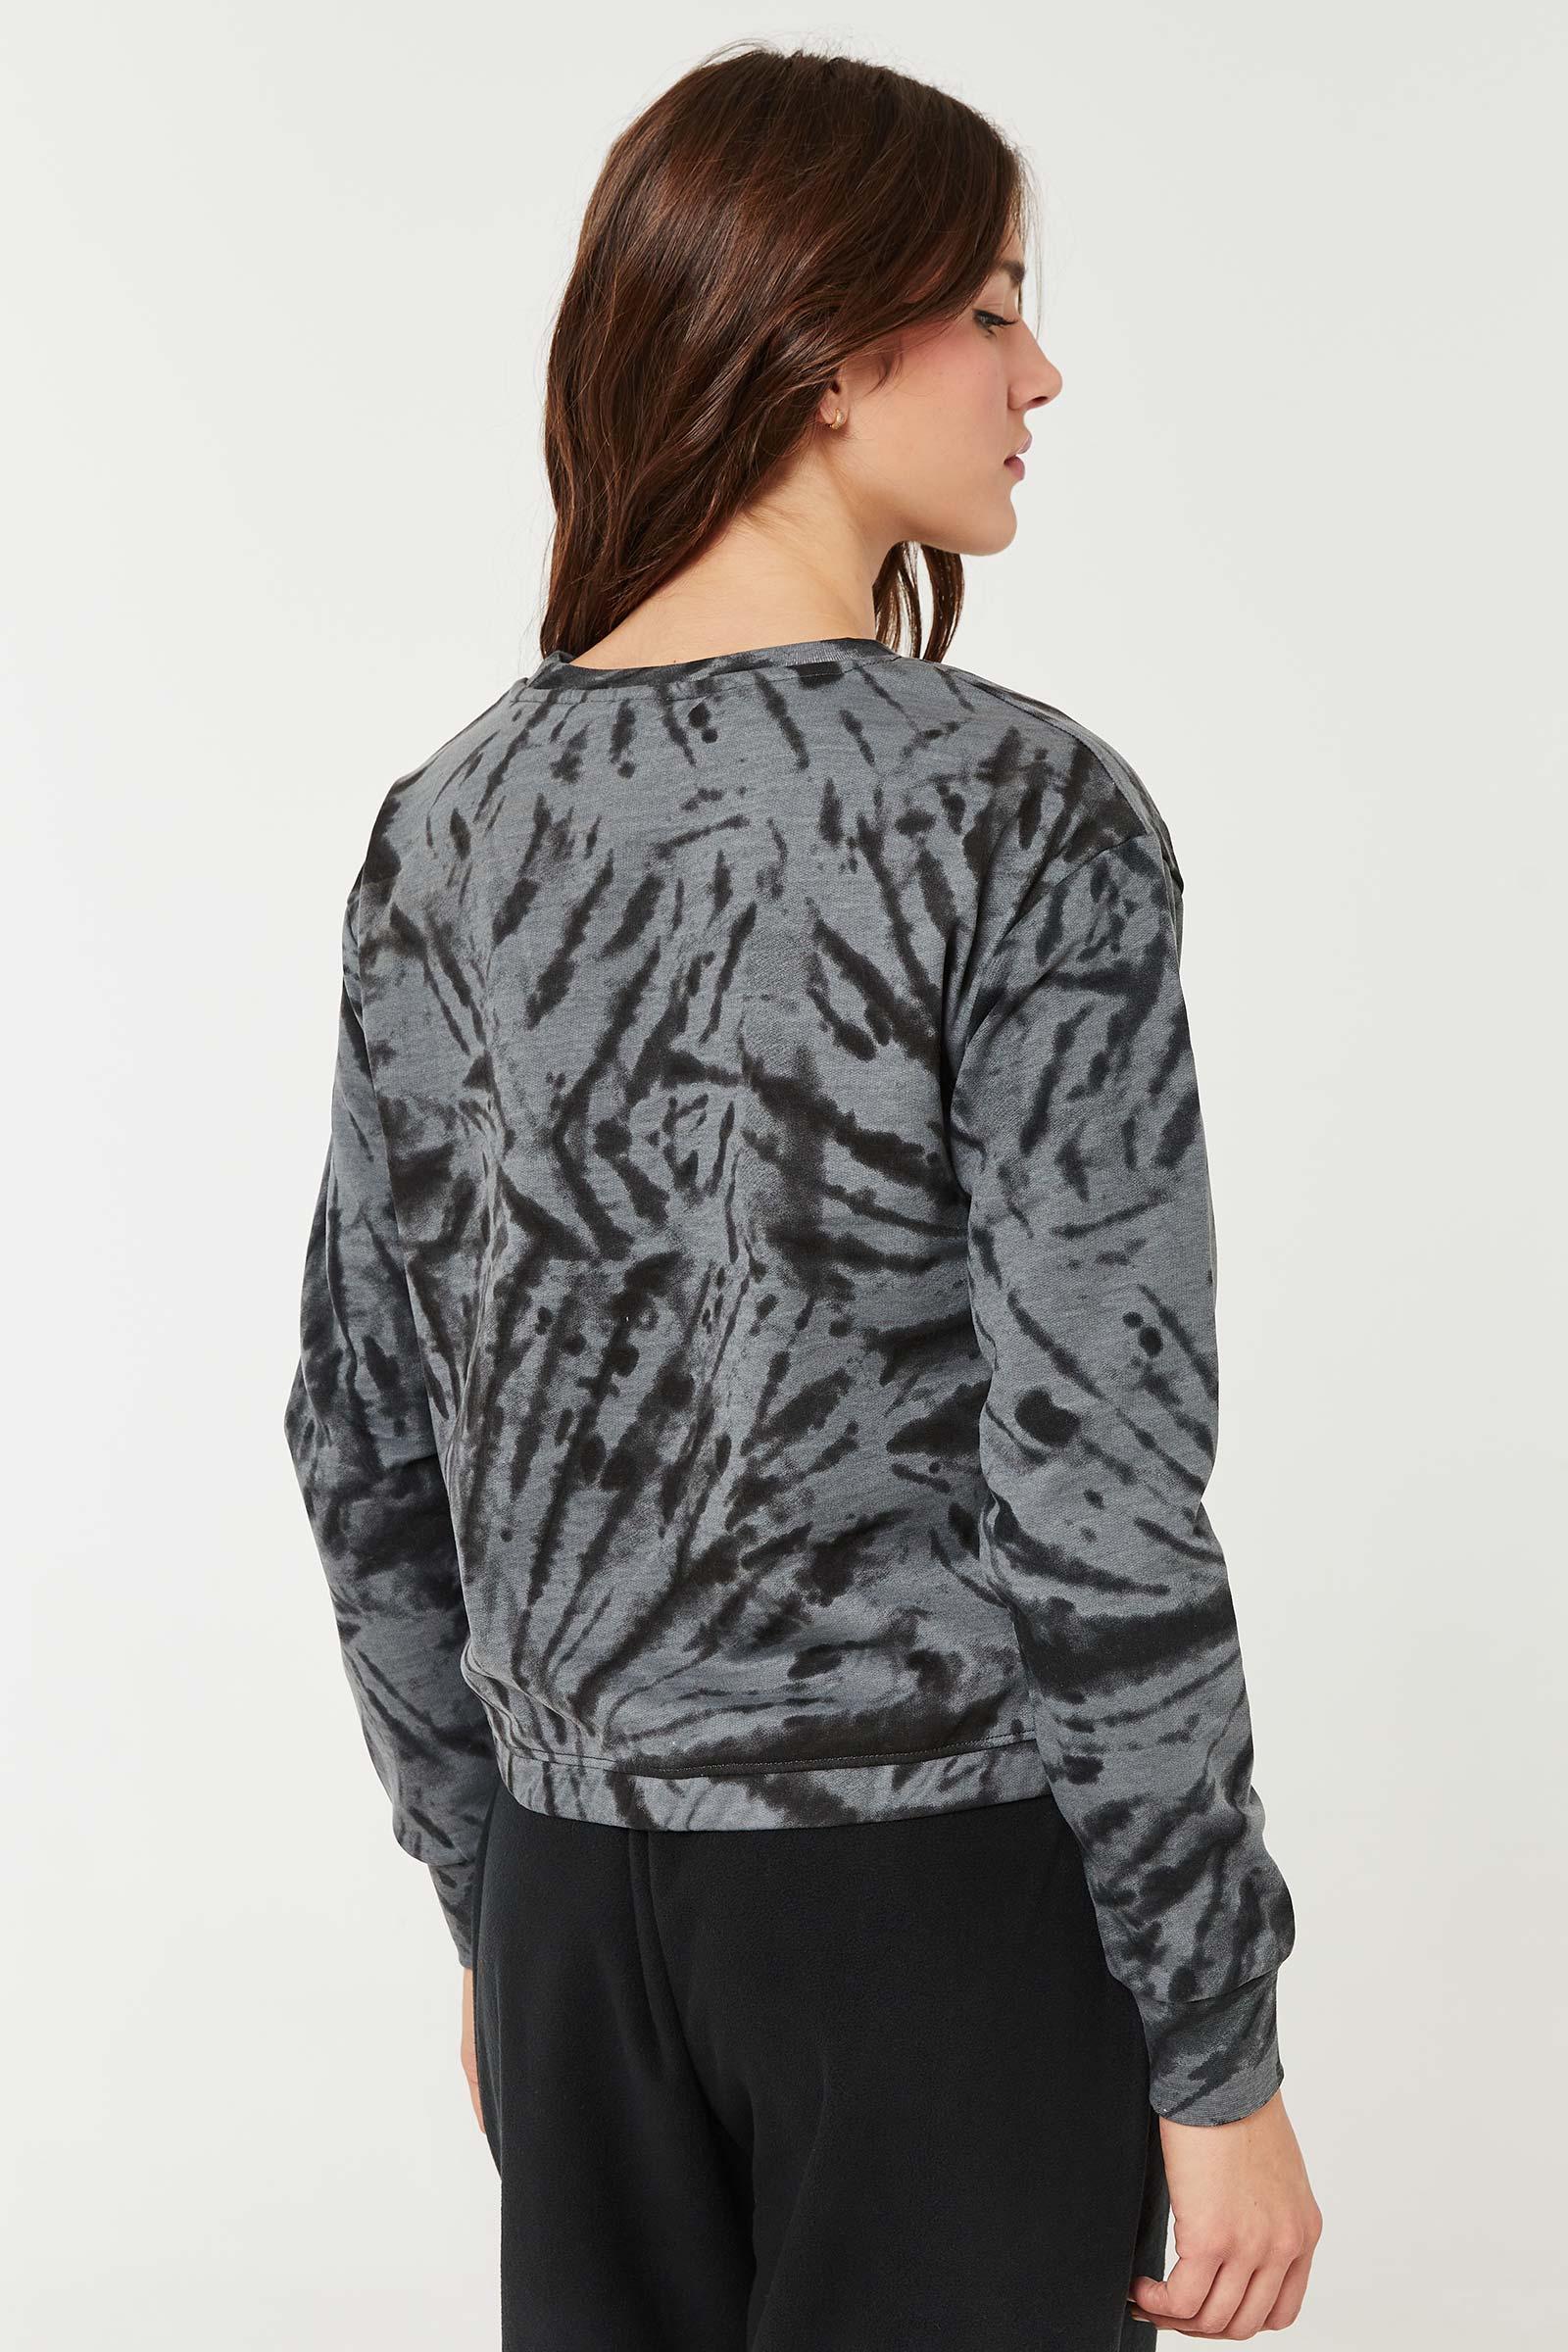 The Simpsons Skeleton Sweatshirt